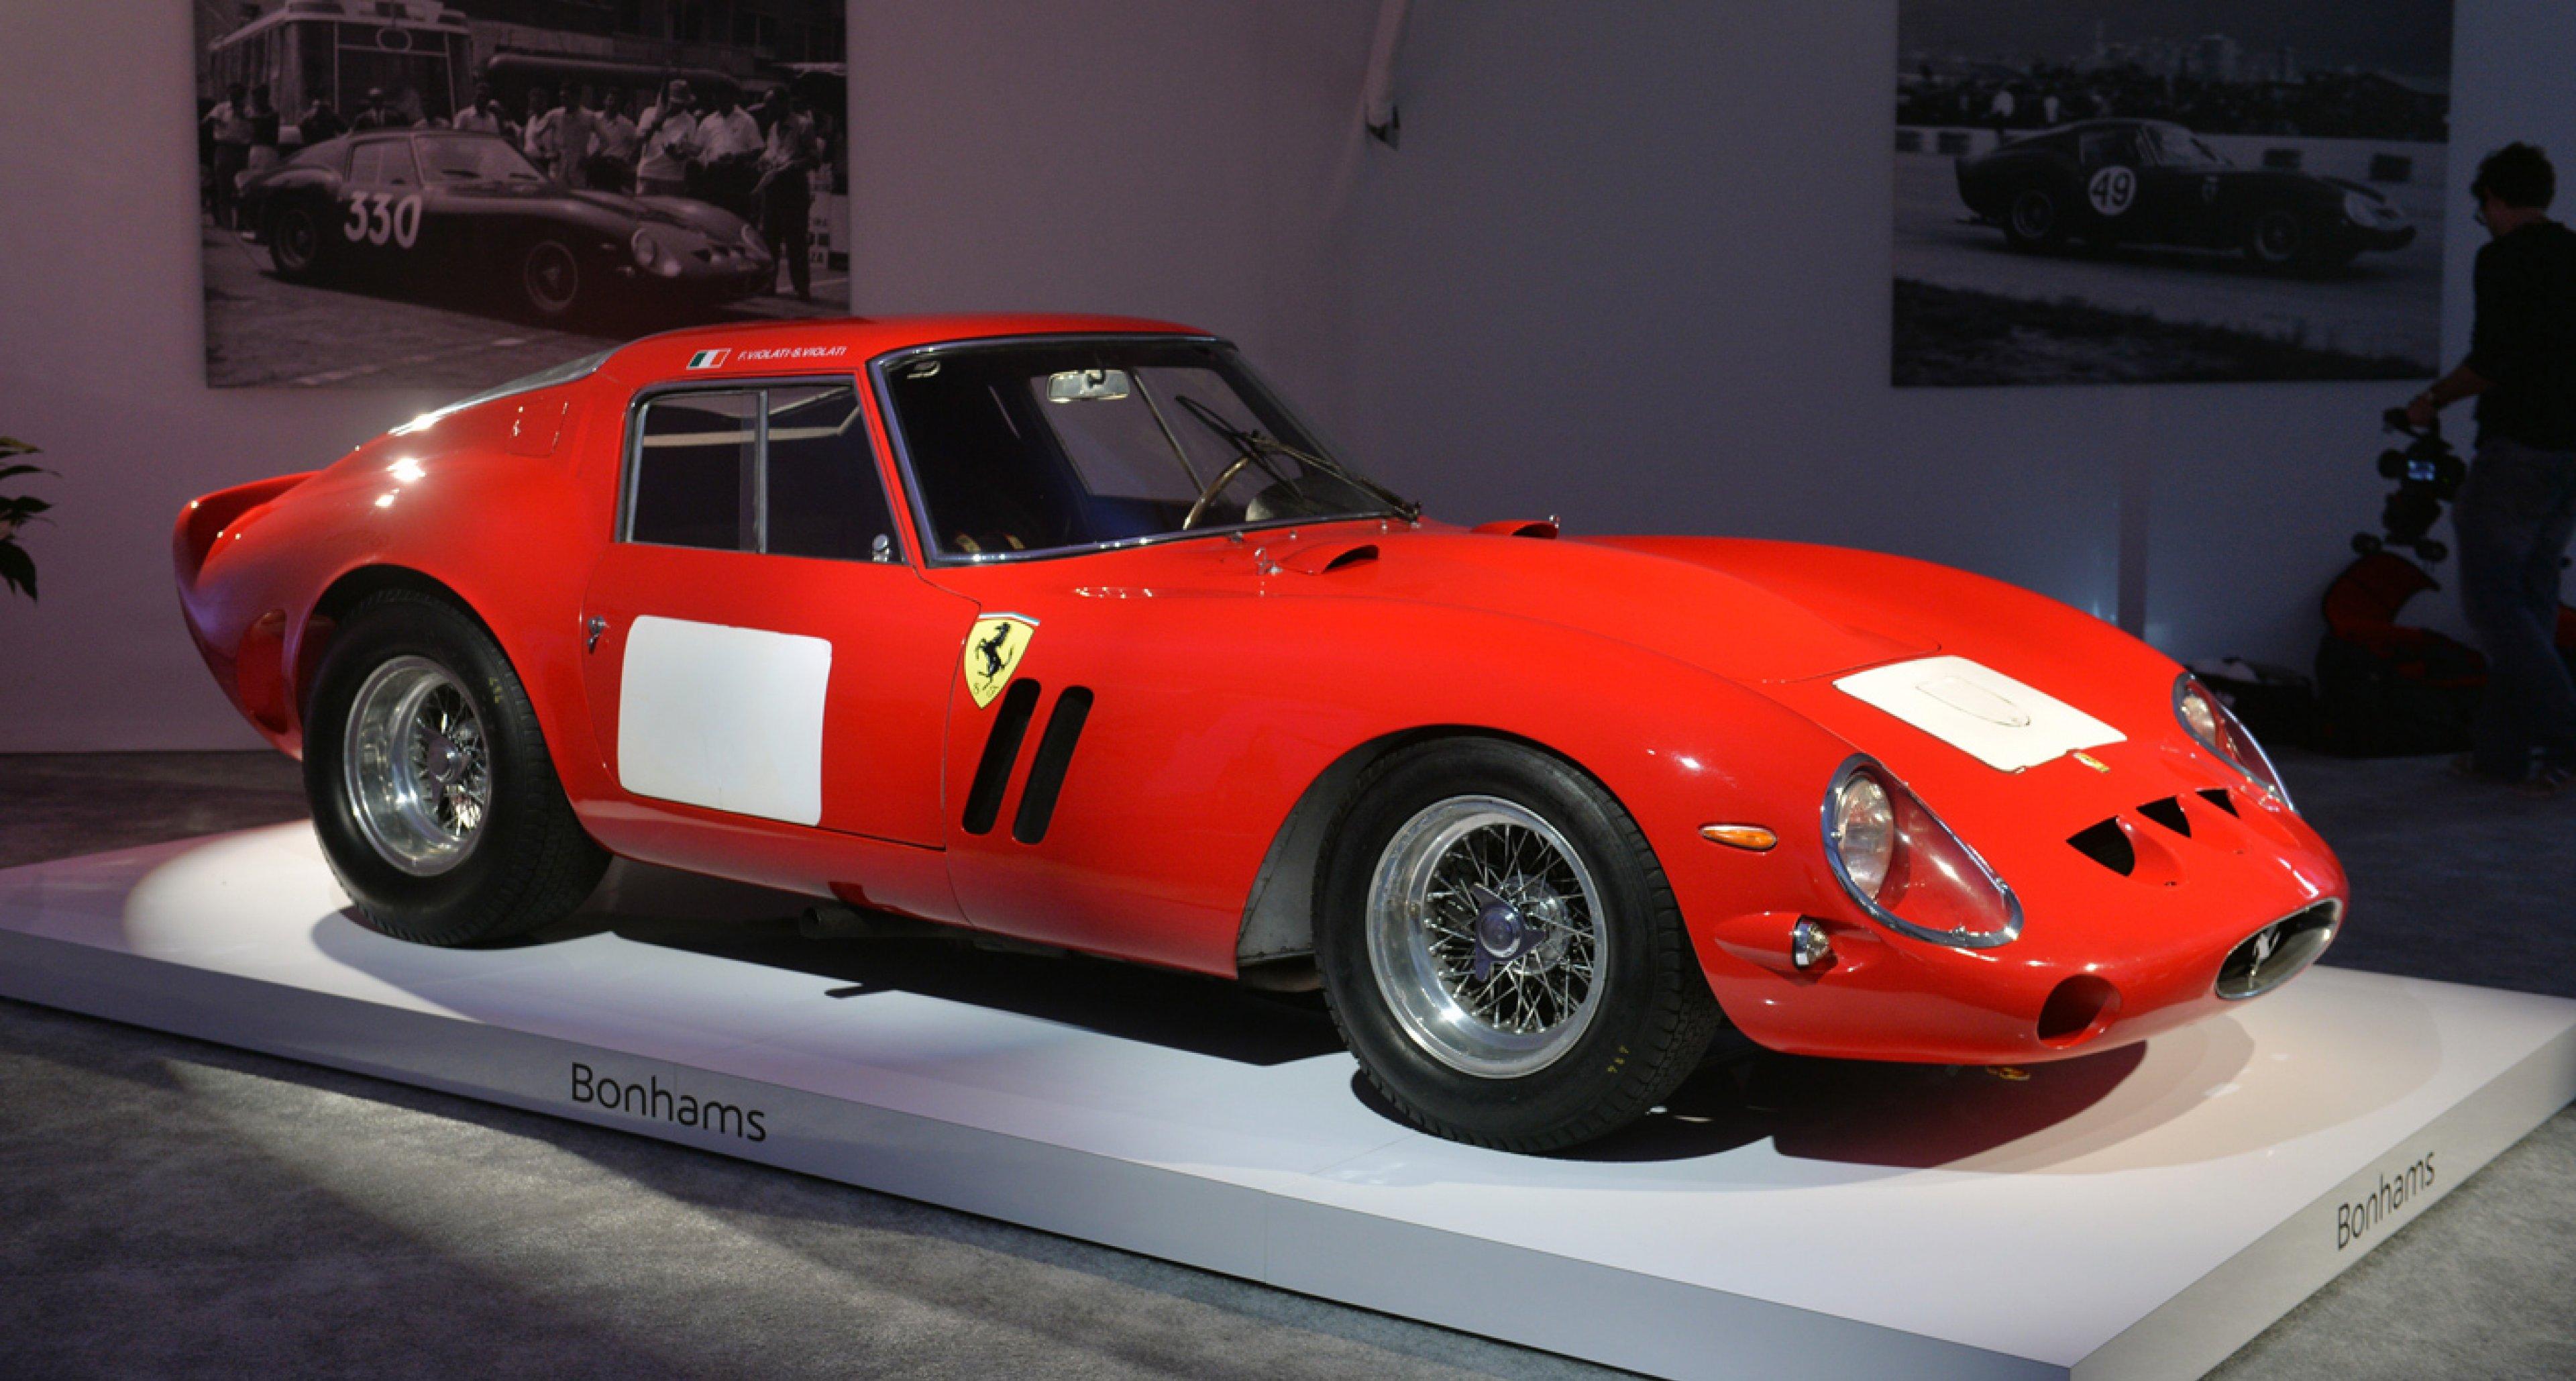 1962 Ferrari 250 GTO sold for USD 38,115,000 at Bonhams Quail Lodge sale 2014